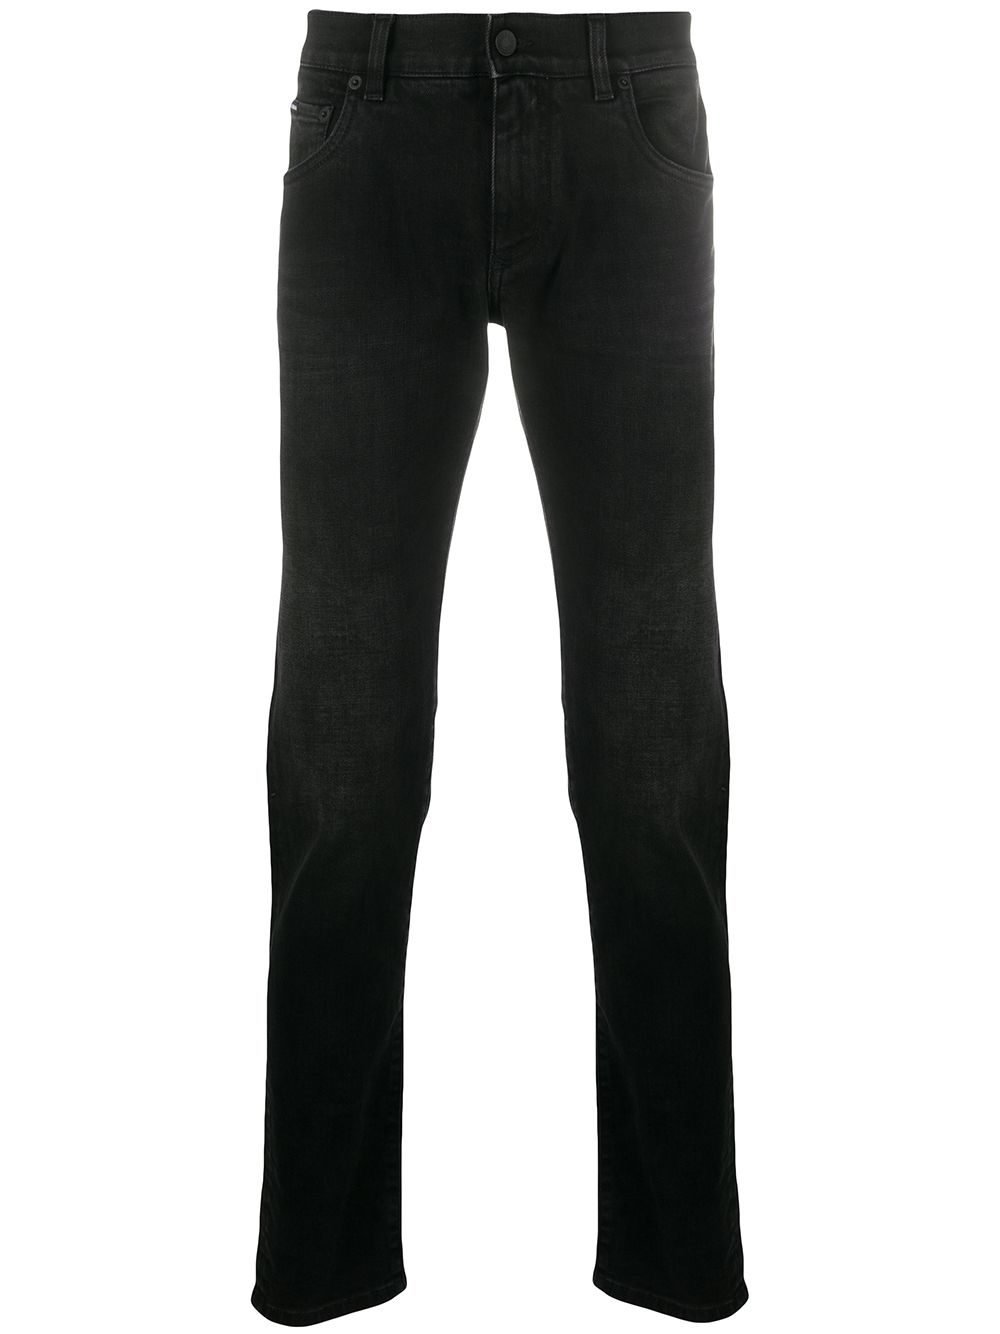 black slim-fit stretch denim jeans  DOLCE & GABBANA |  | GY07LD-G8CO2S9001